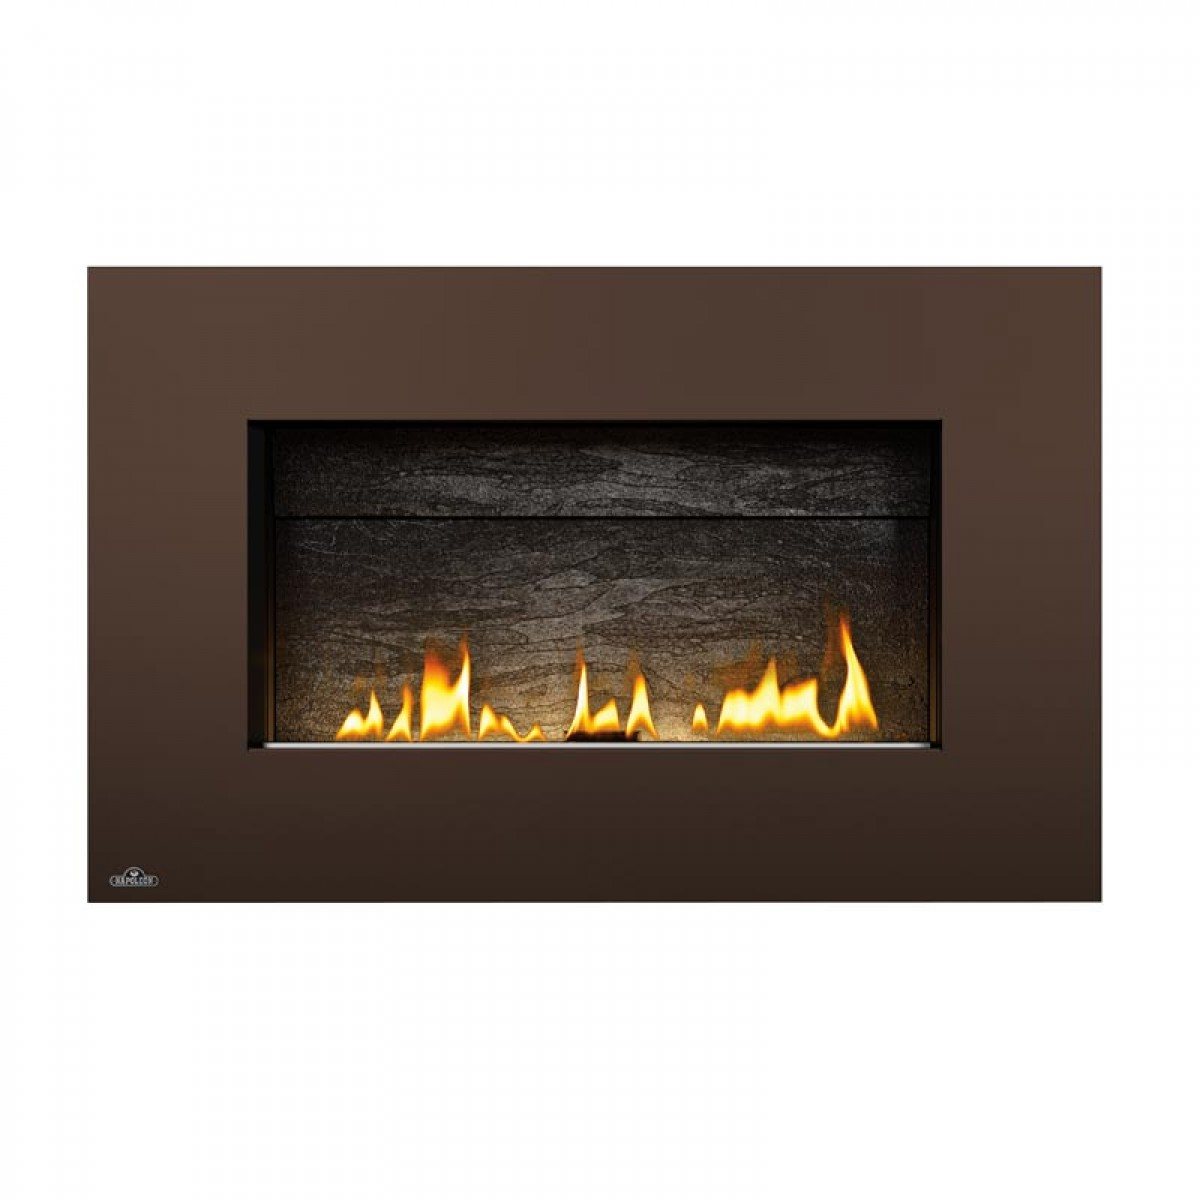 Napoleon Whvf31n Plazmafire Vent Free Natural Gas